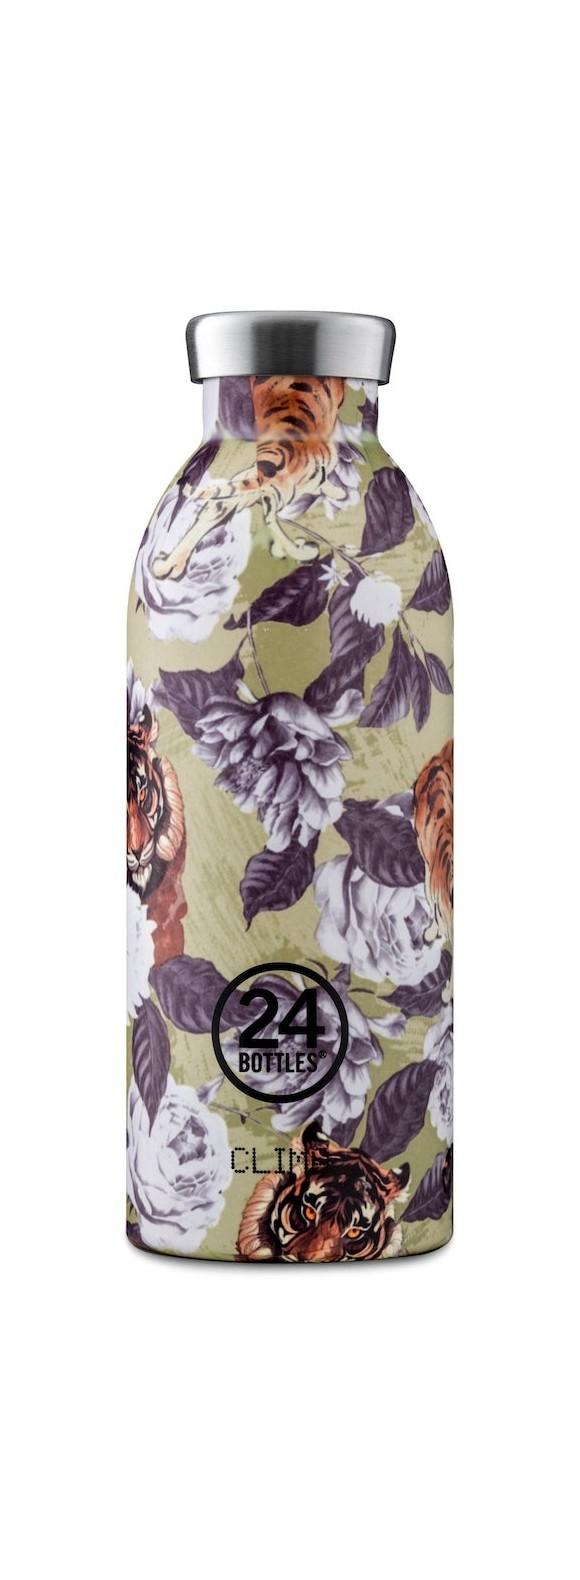 24 Bottles - Clima Bottle 0,5 L - Rajah